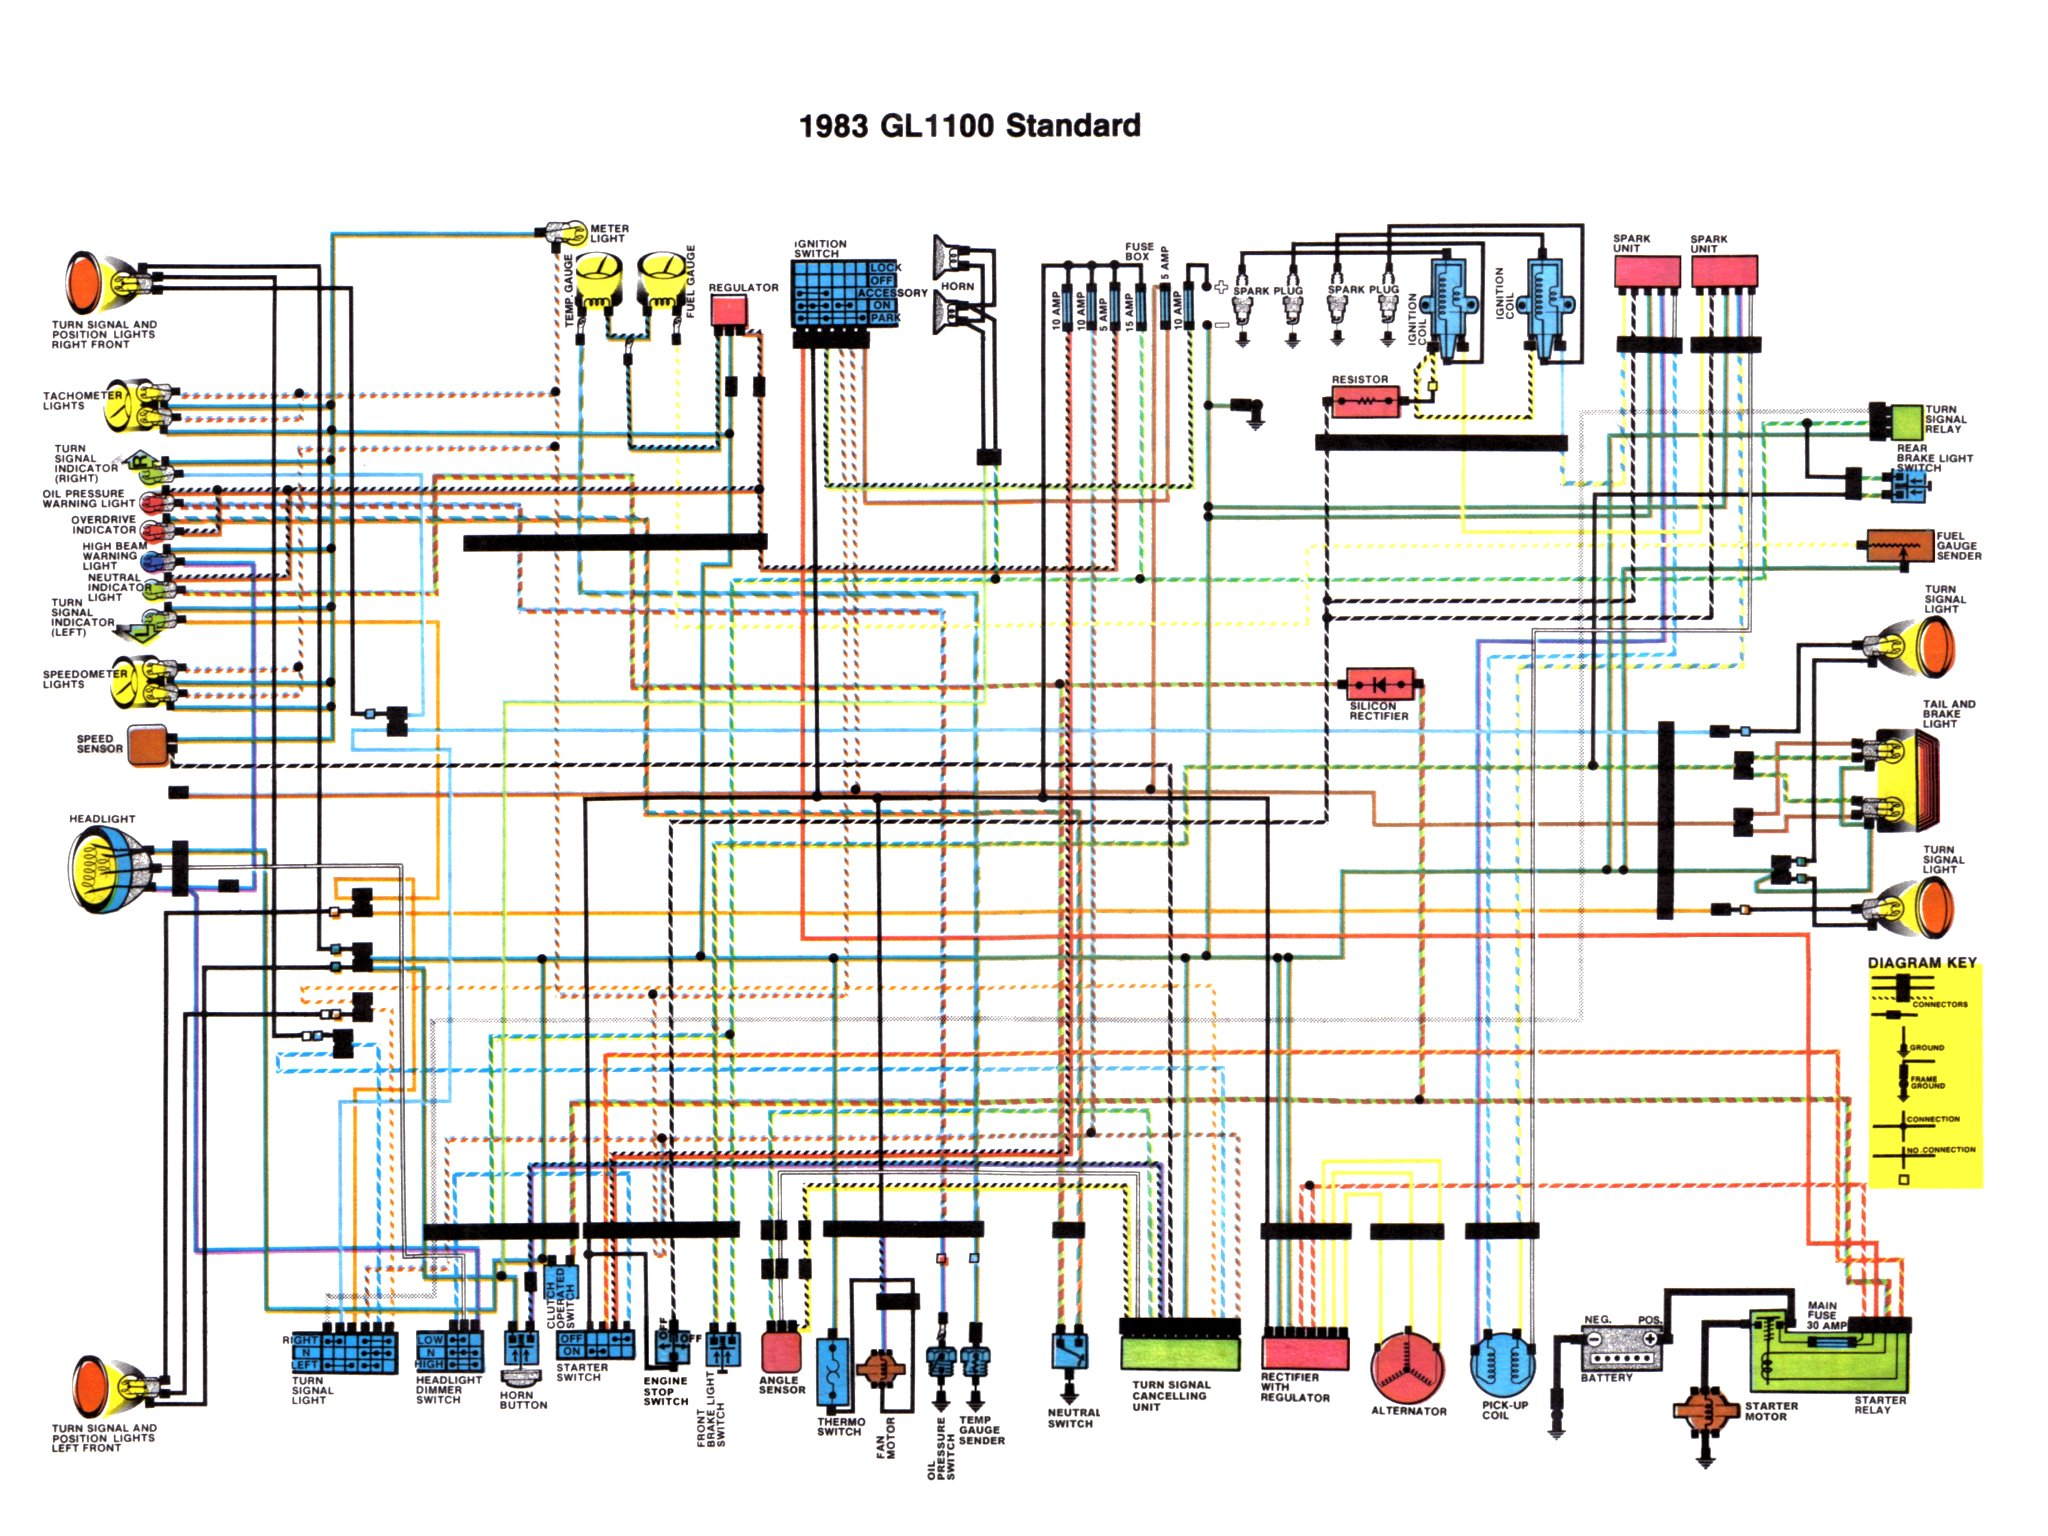 B53 1985 Atc 250es Wiring Diagram | Wiring LibraryWiring Library